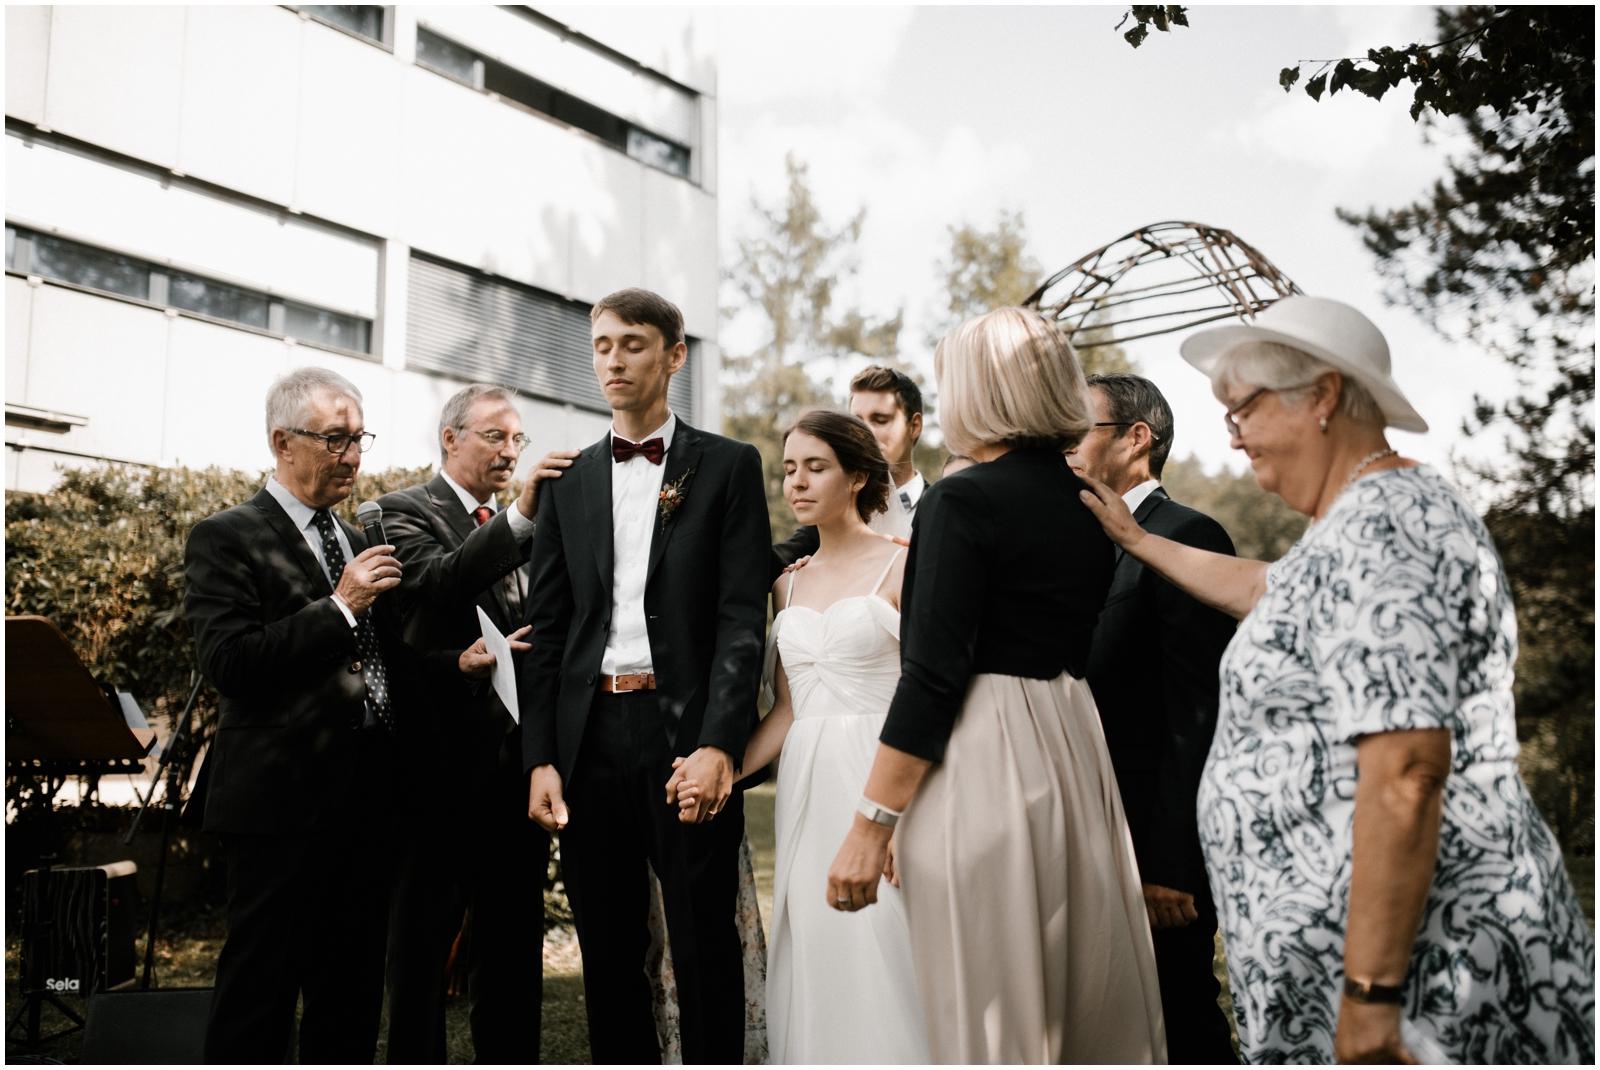 mirjam_thomas_wedding-421.jpg